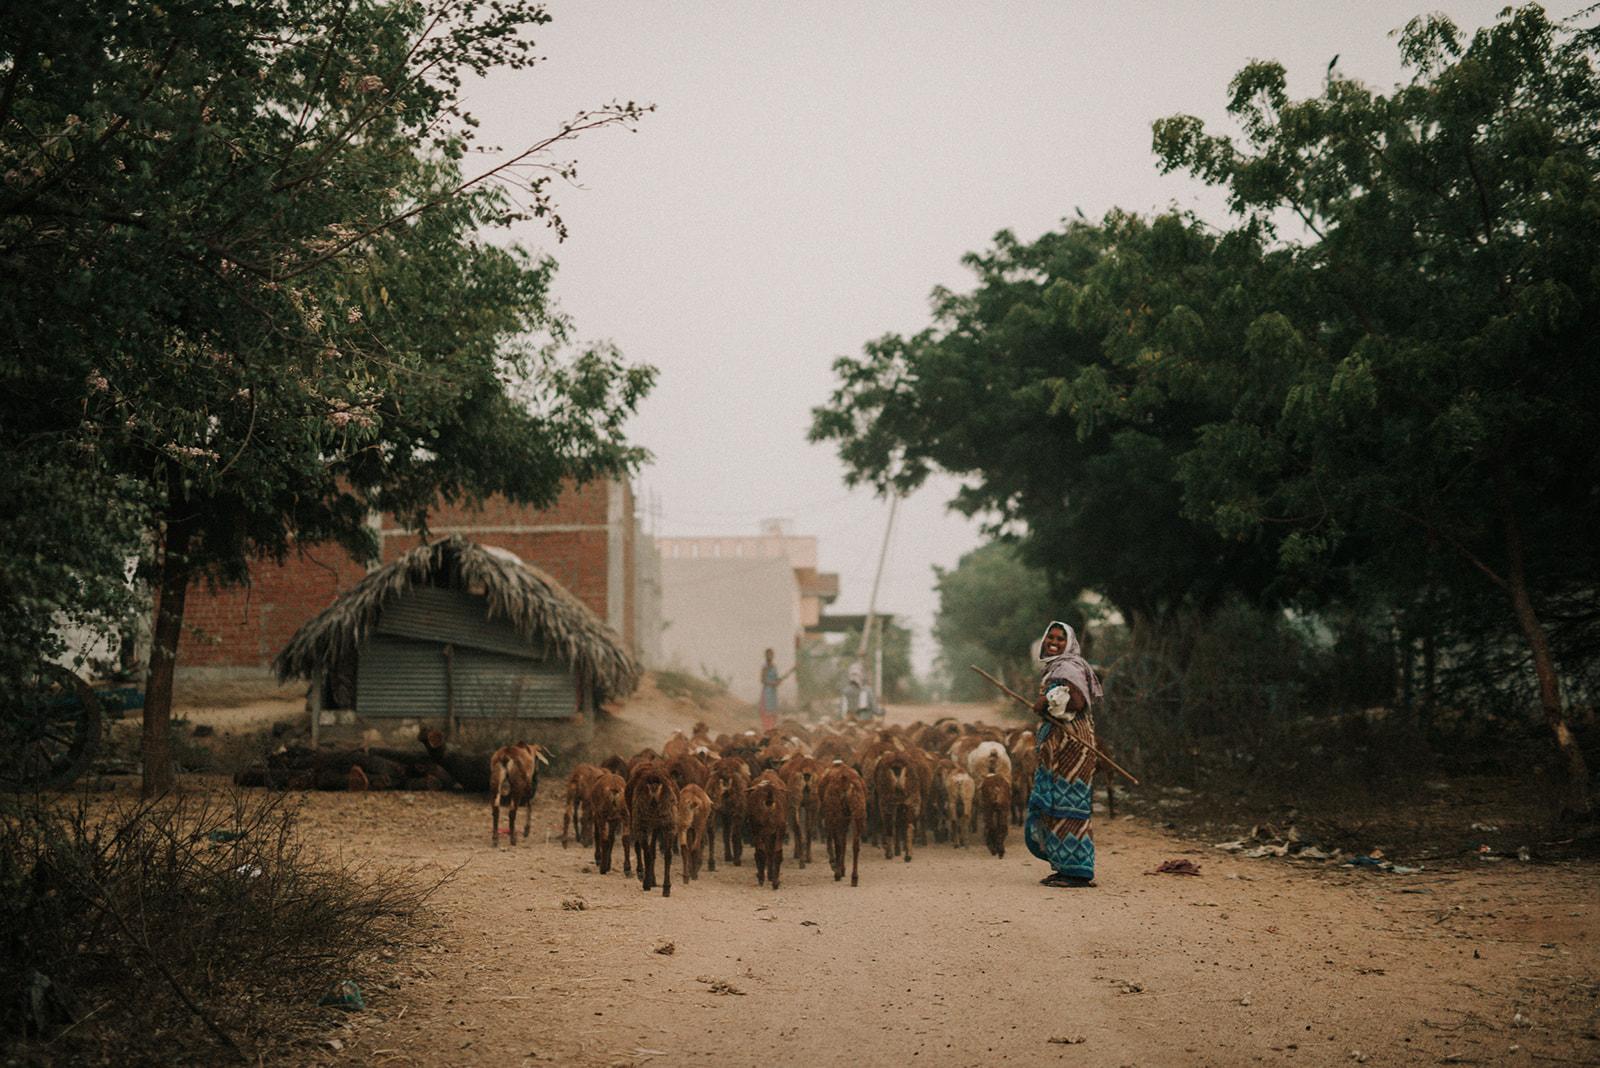 CCH_INDIA_HUMANITARIAN_NGO_TaraShupe_Photography_DSC_6343.jpg